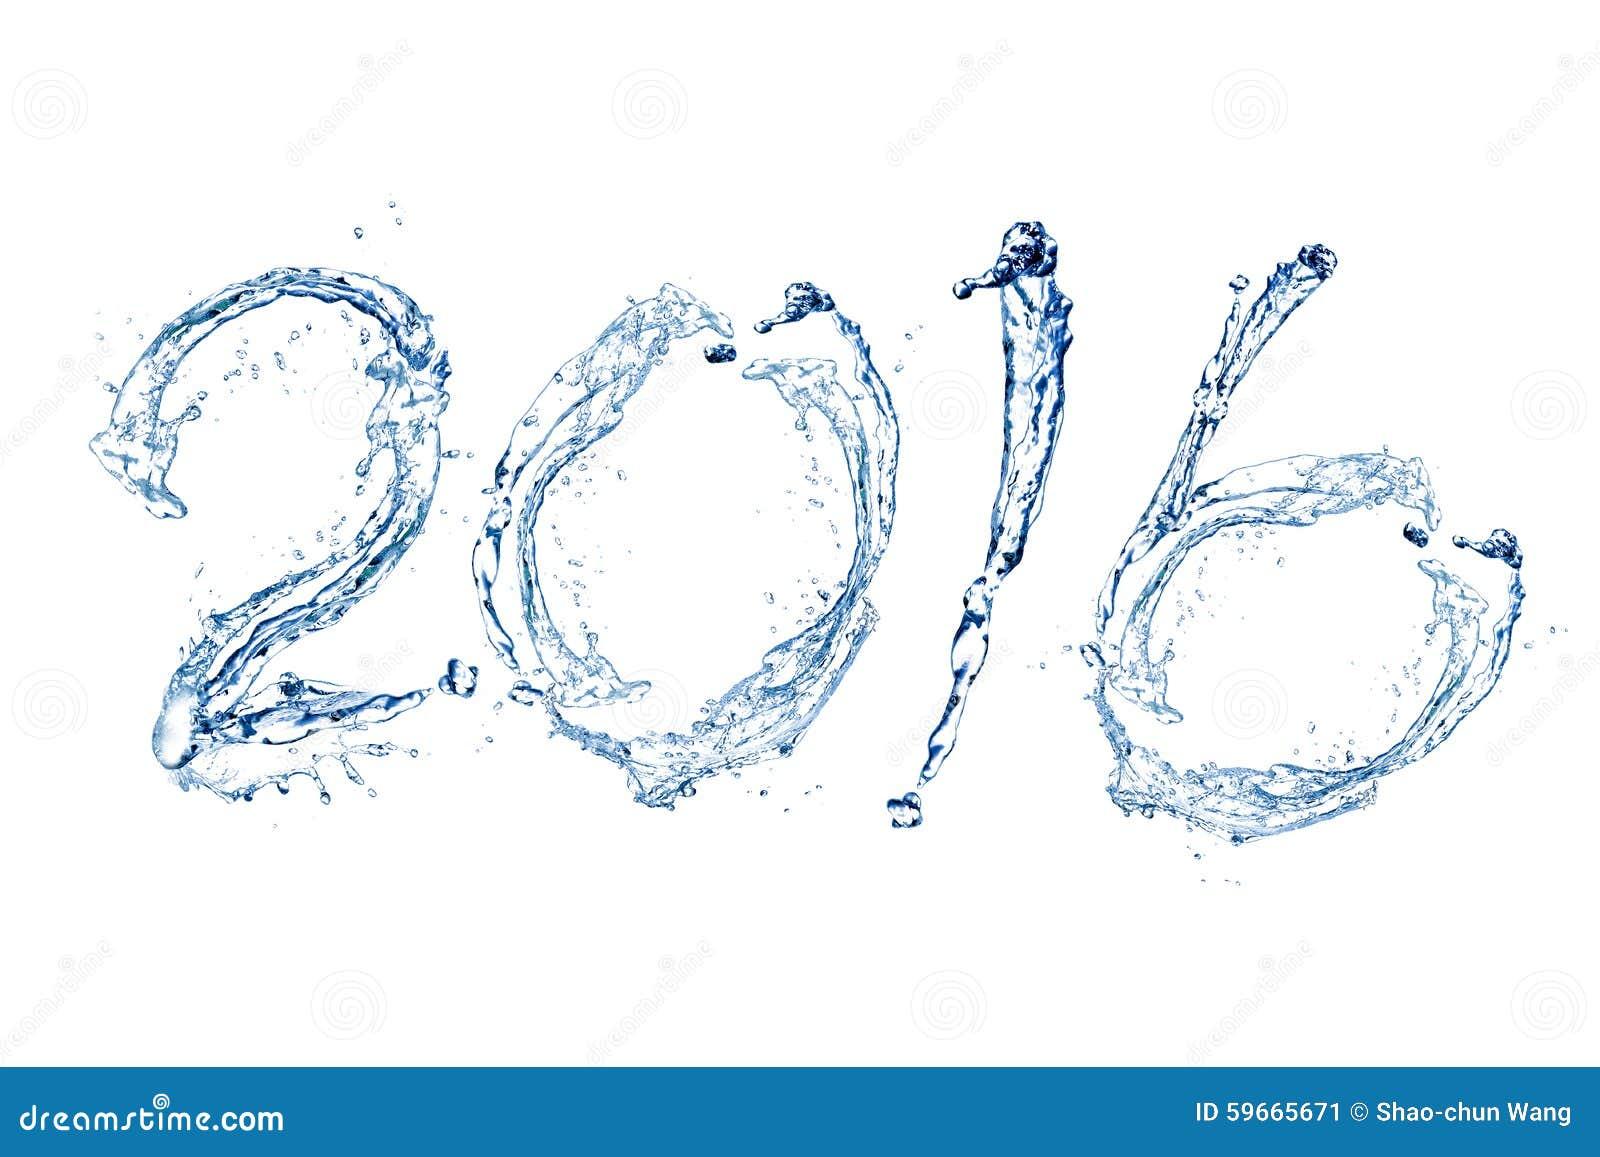 New year 2016 stock photo image 58693644 - Happy New Year 2016 Stock Image